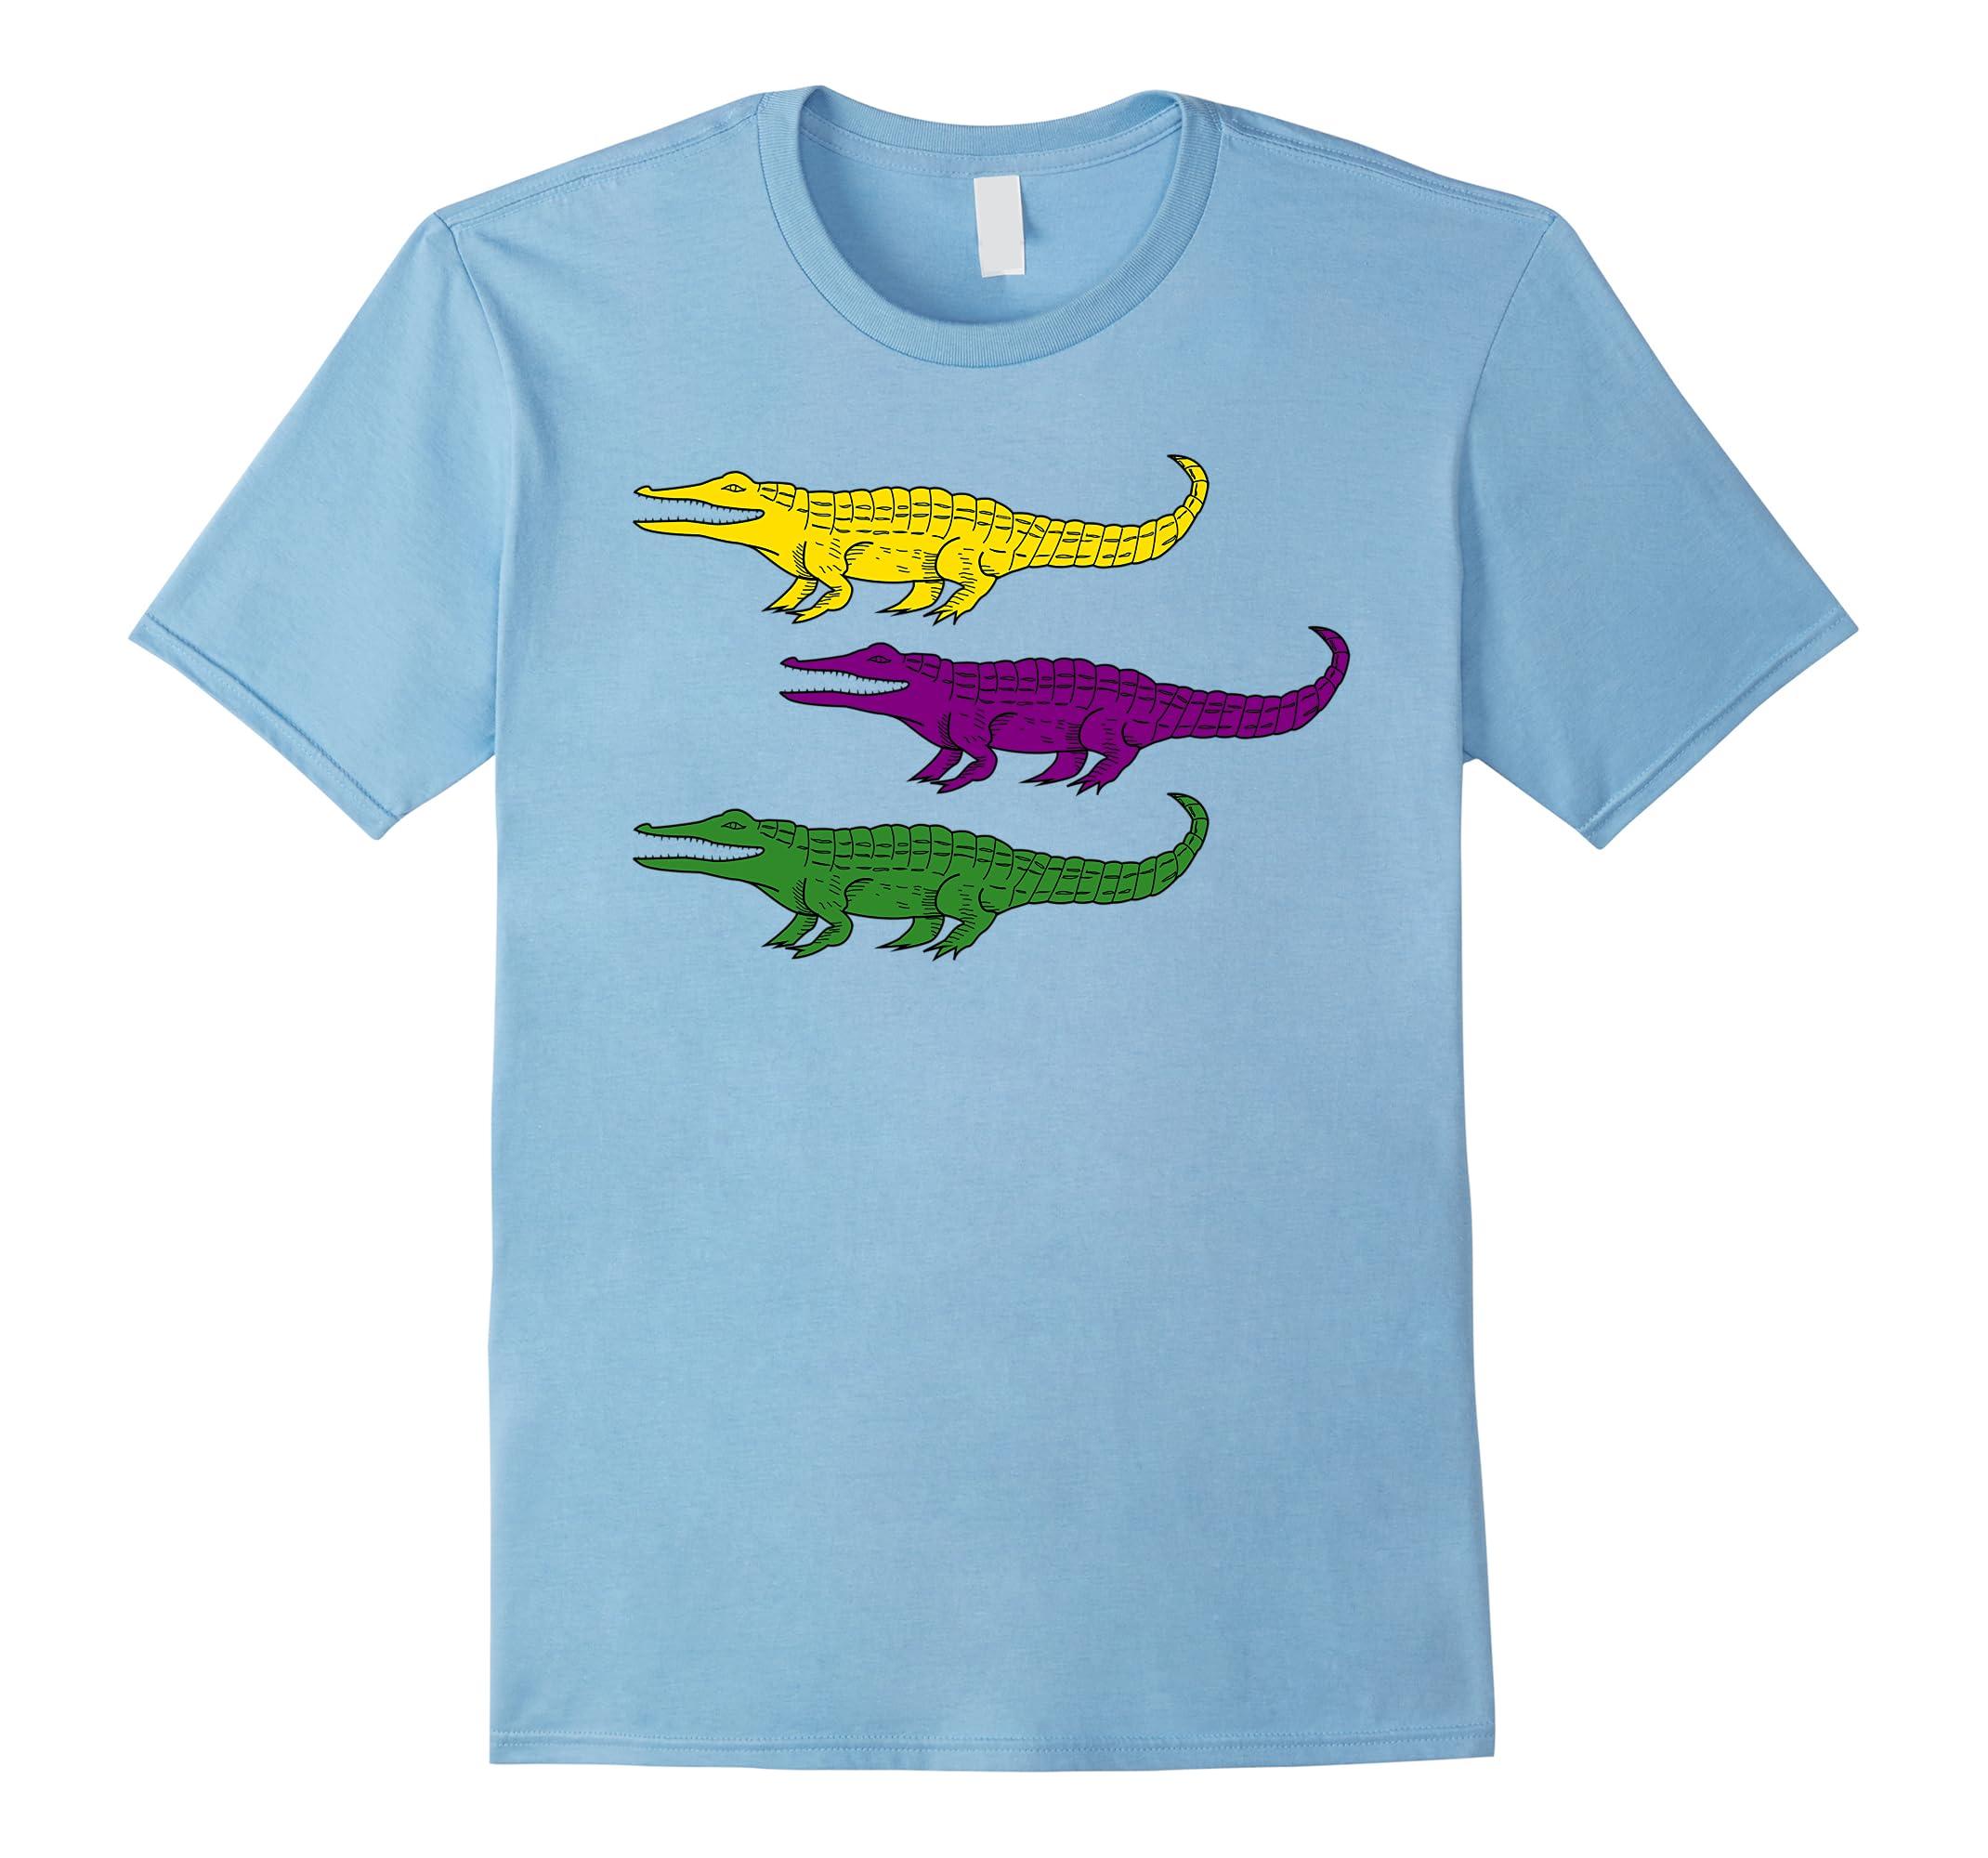 Mardi Gras Alligator Gators Crocodile T Shirt Ah My Shirt One Gift